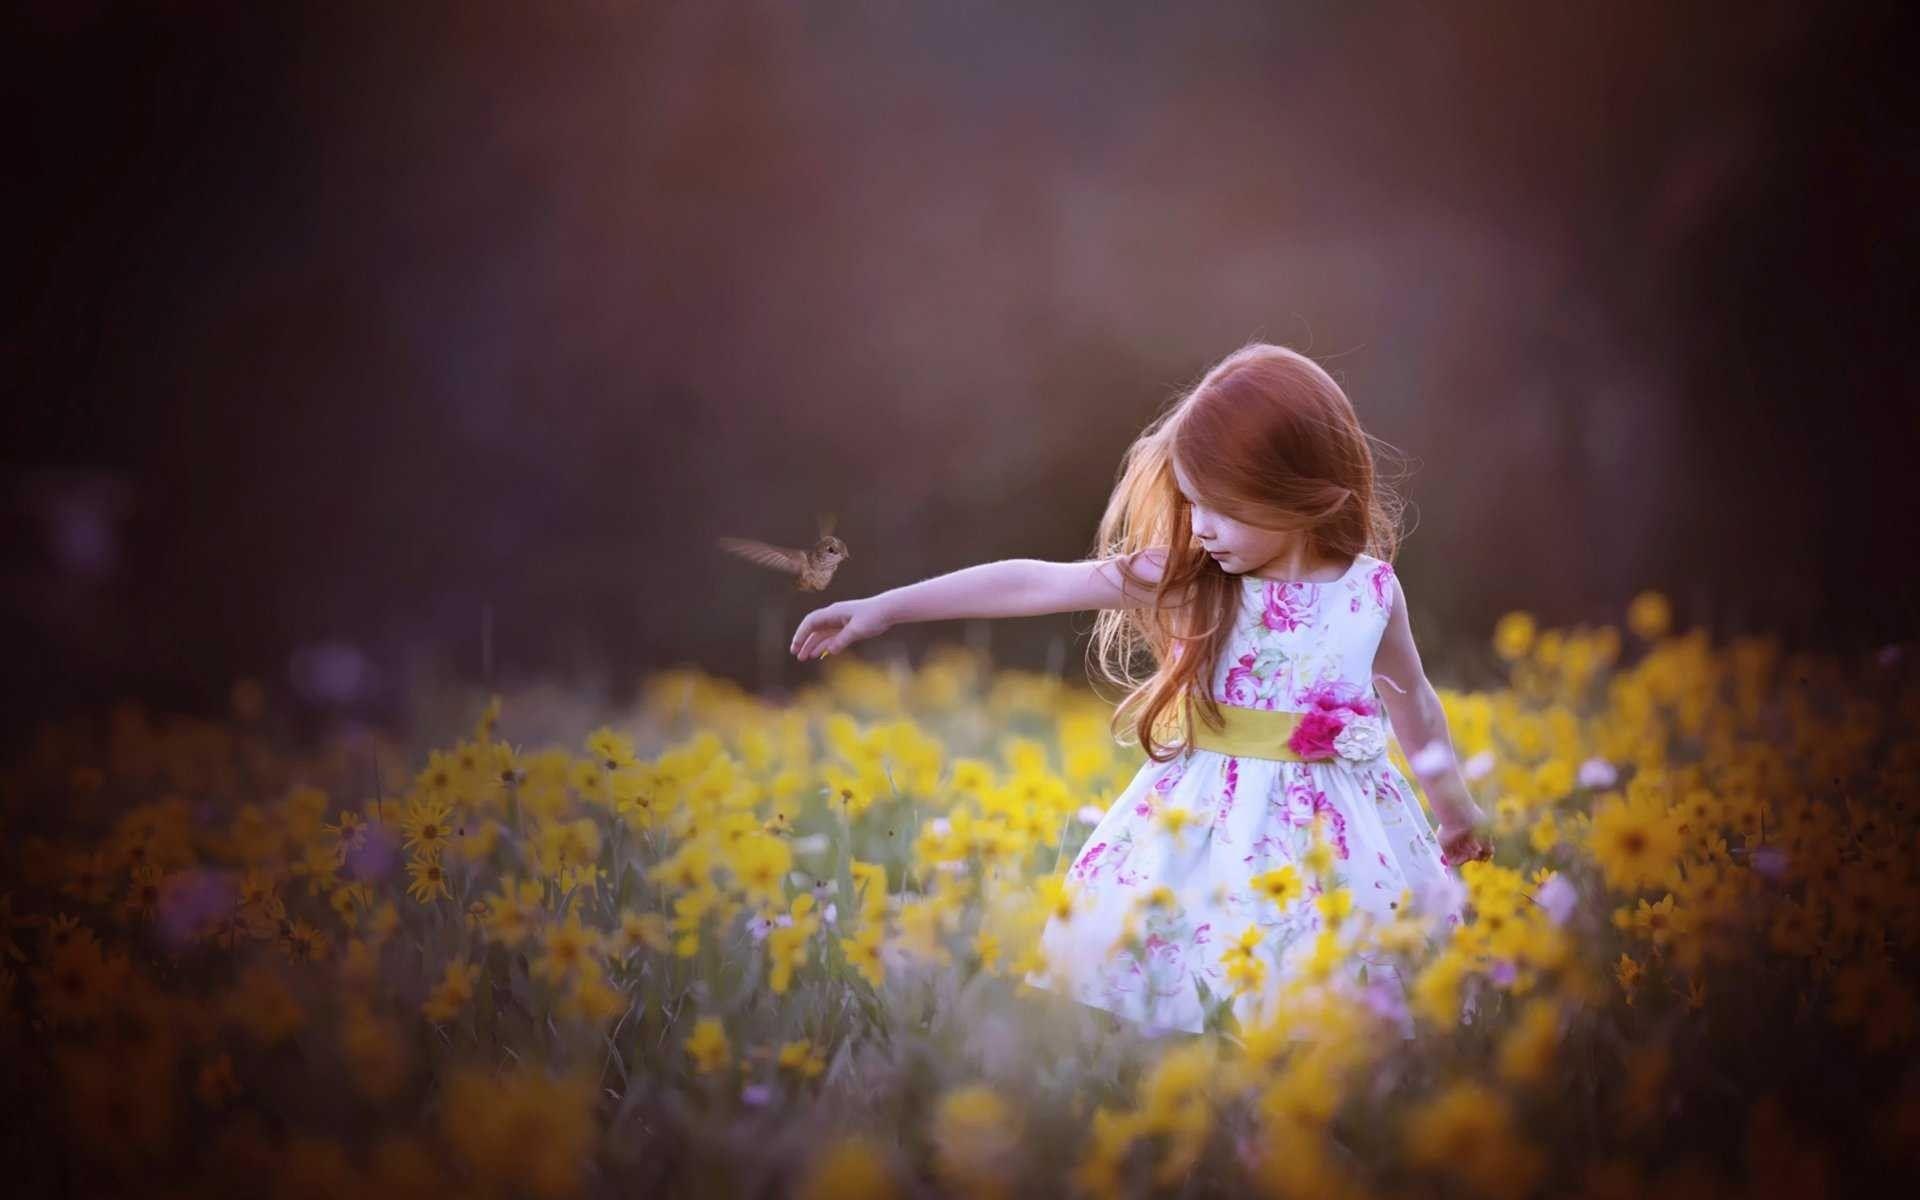 Cute Little Girl With Bird Hd Wallpapers Hd Wallpapers Met